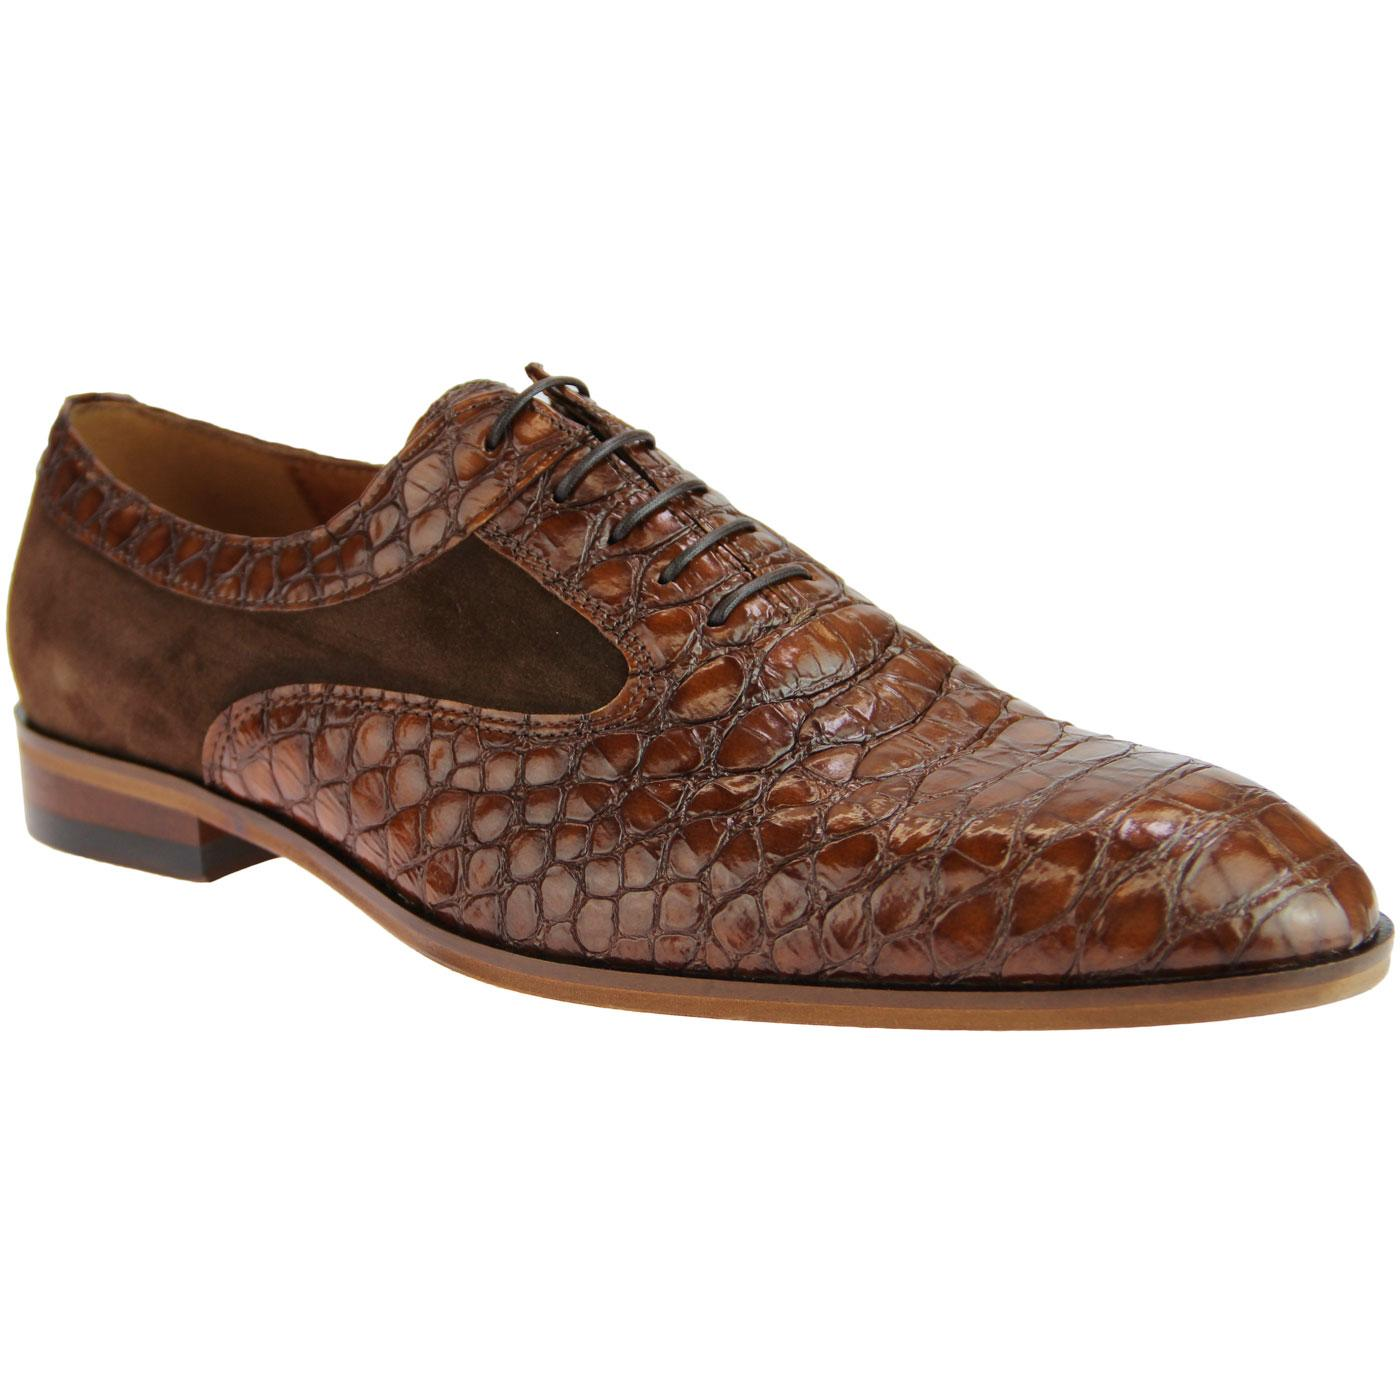 LACUZZO Retro Mod Croc Stamp Oxford Shoes (Tan)